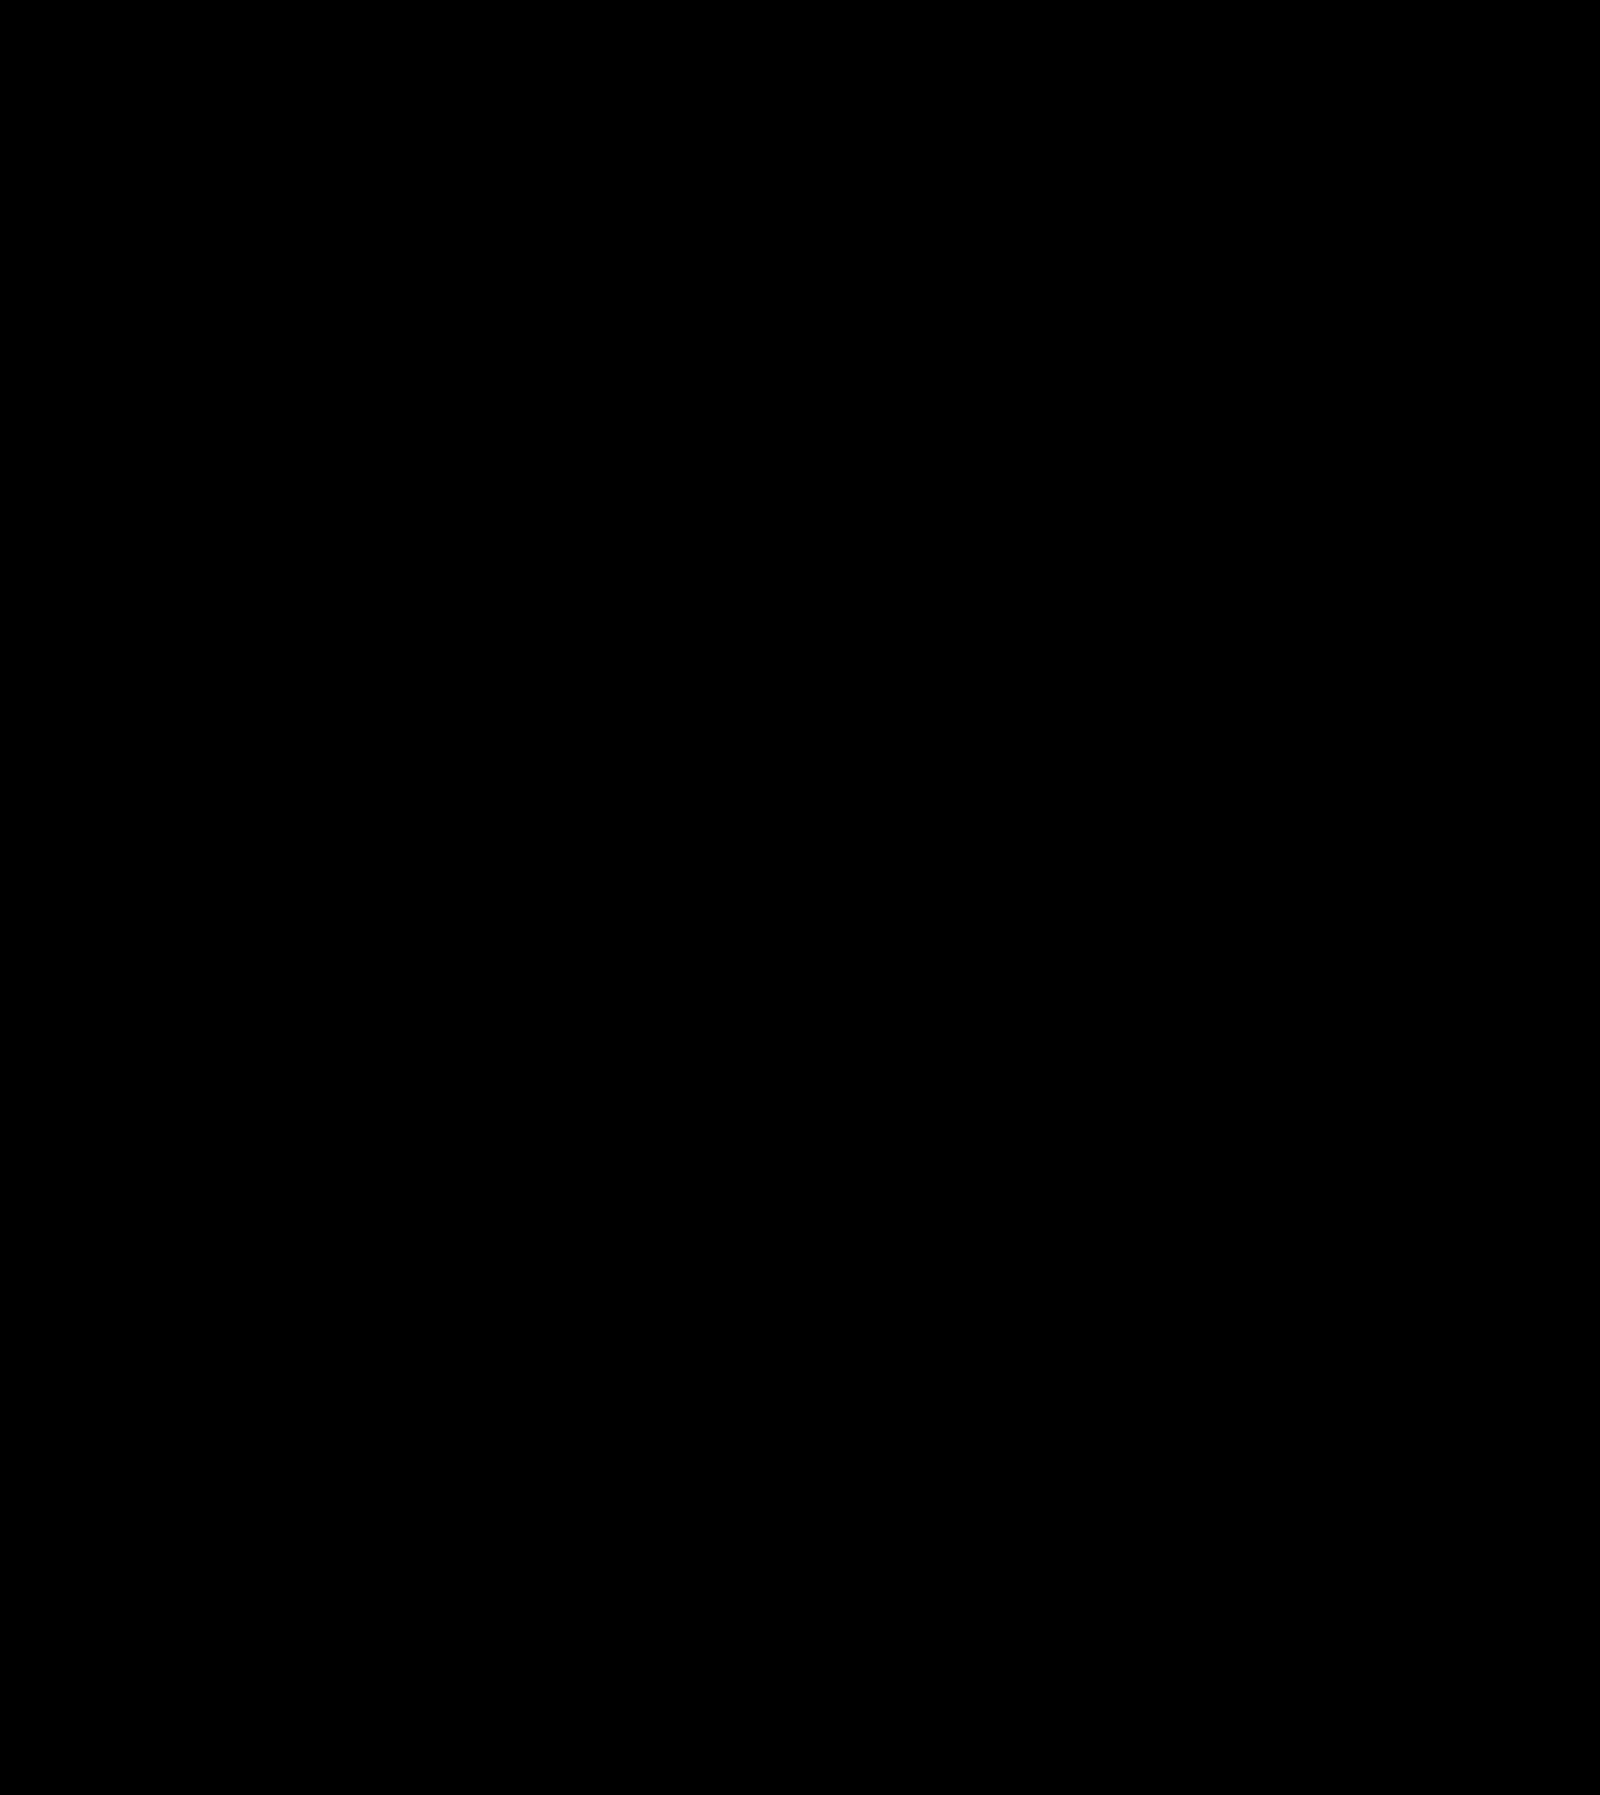 Footprint SVG Clip arts